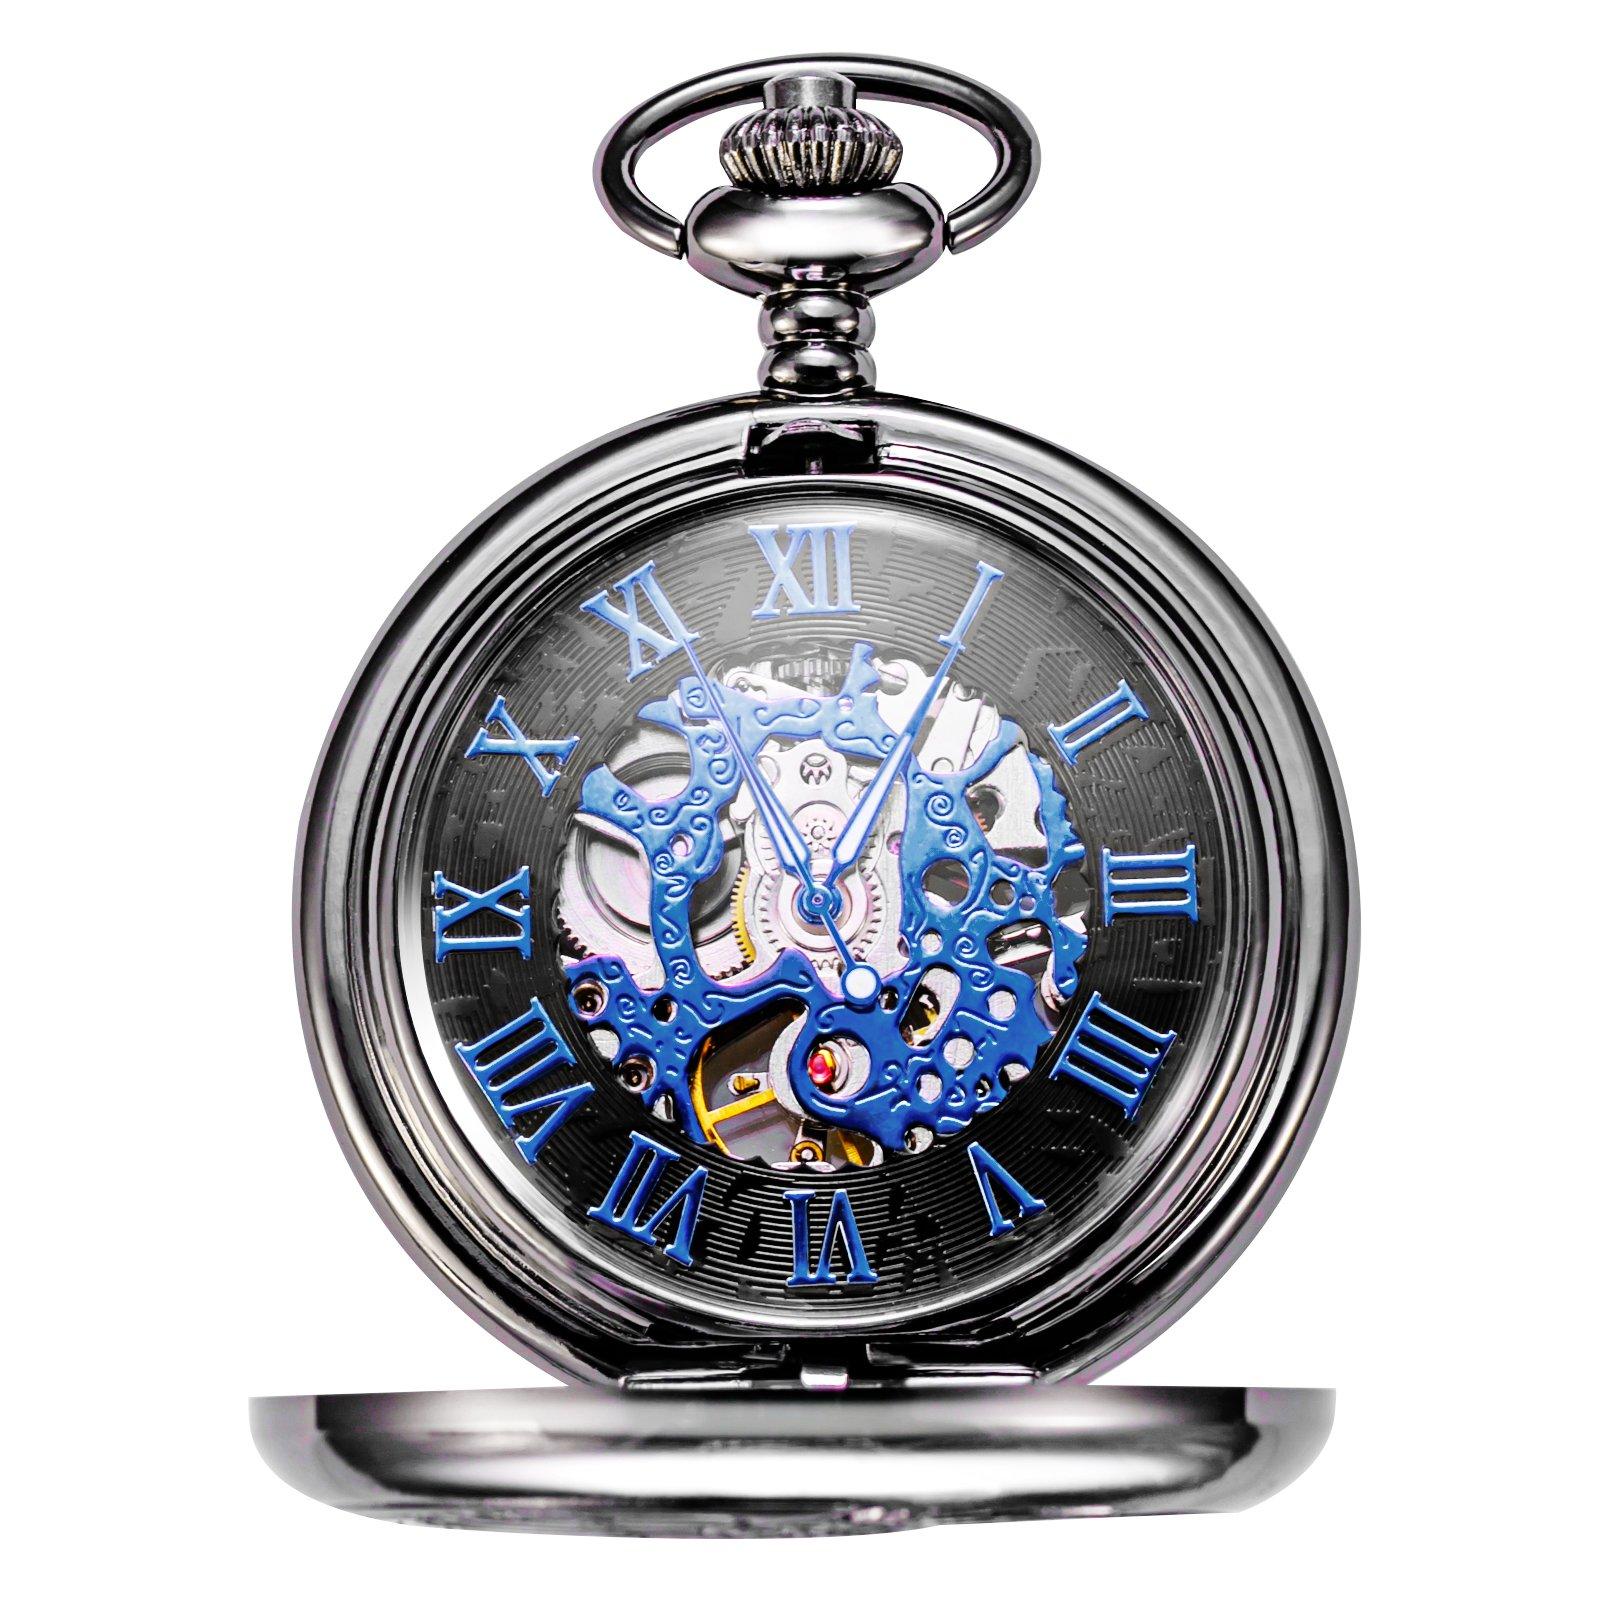 Treeweto Retro Mens Black Skeleton Mechanical Blue Roman Numerals Pocket Watch With Chain